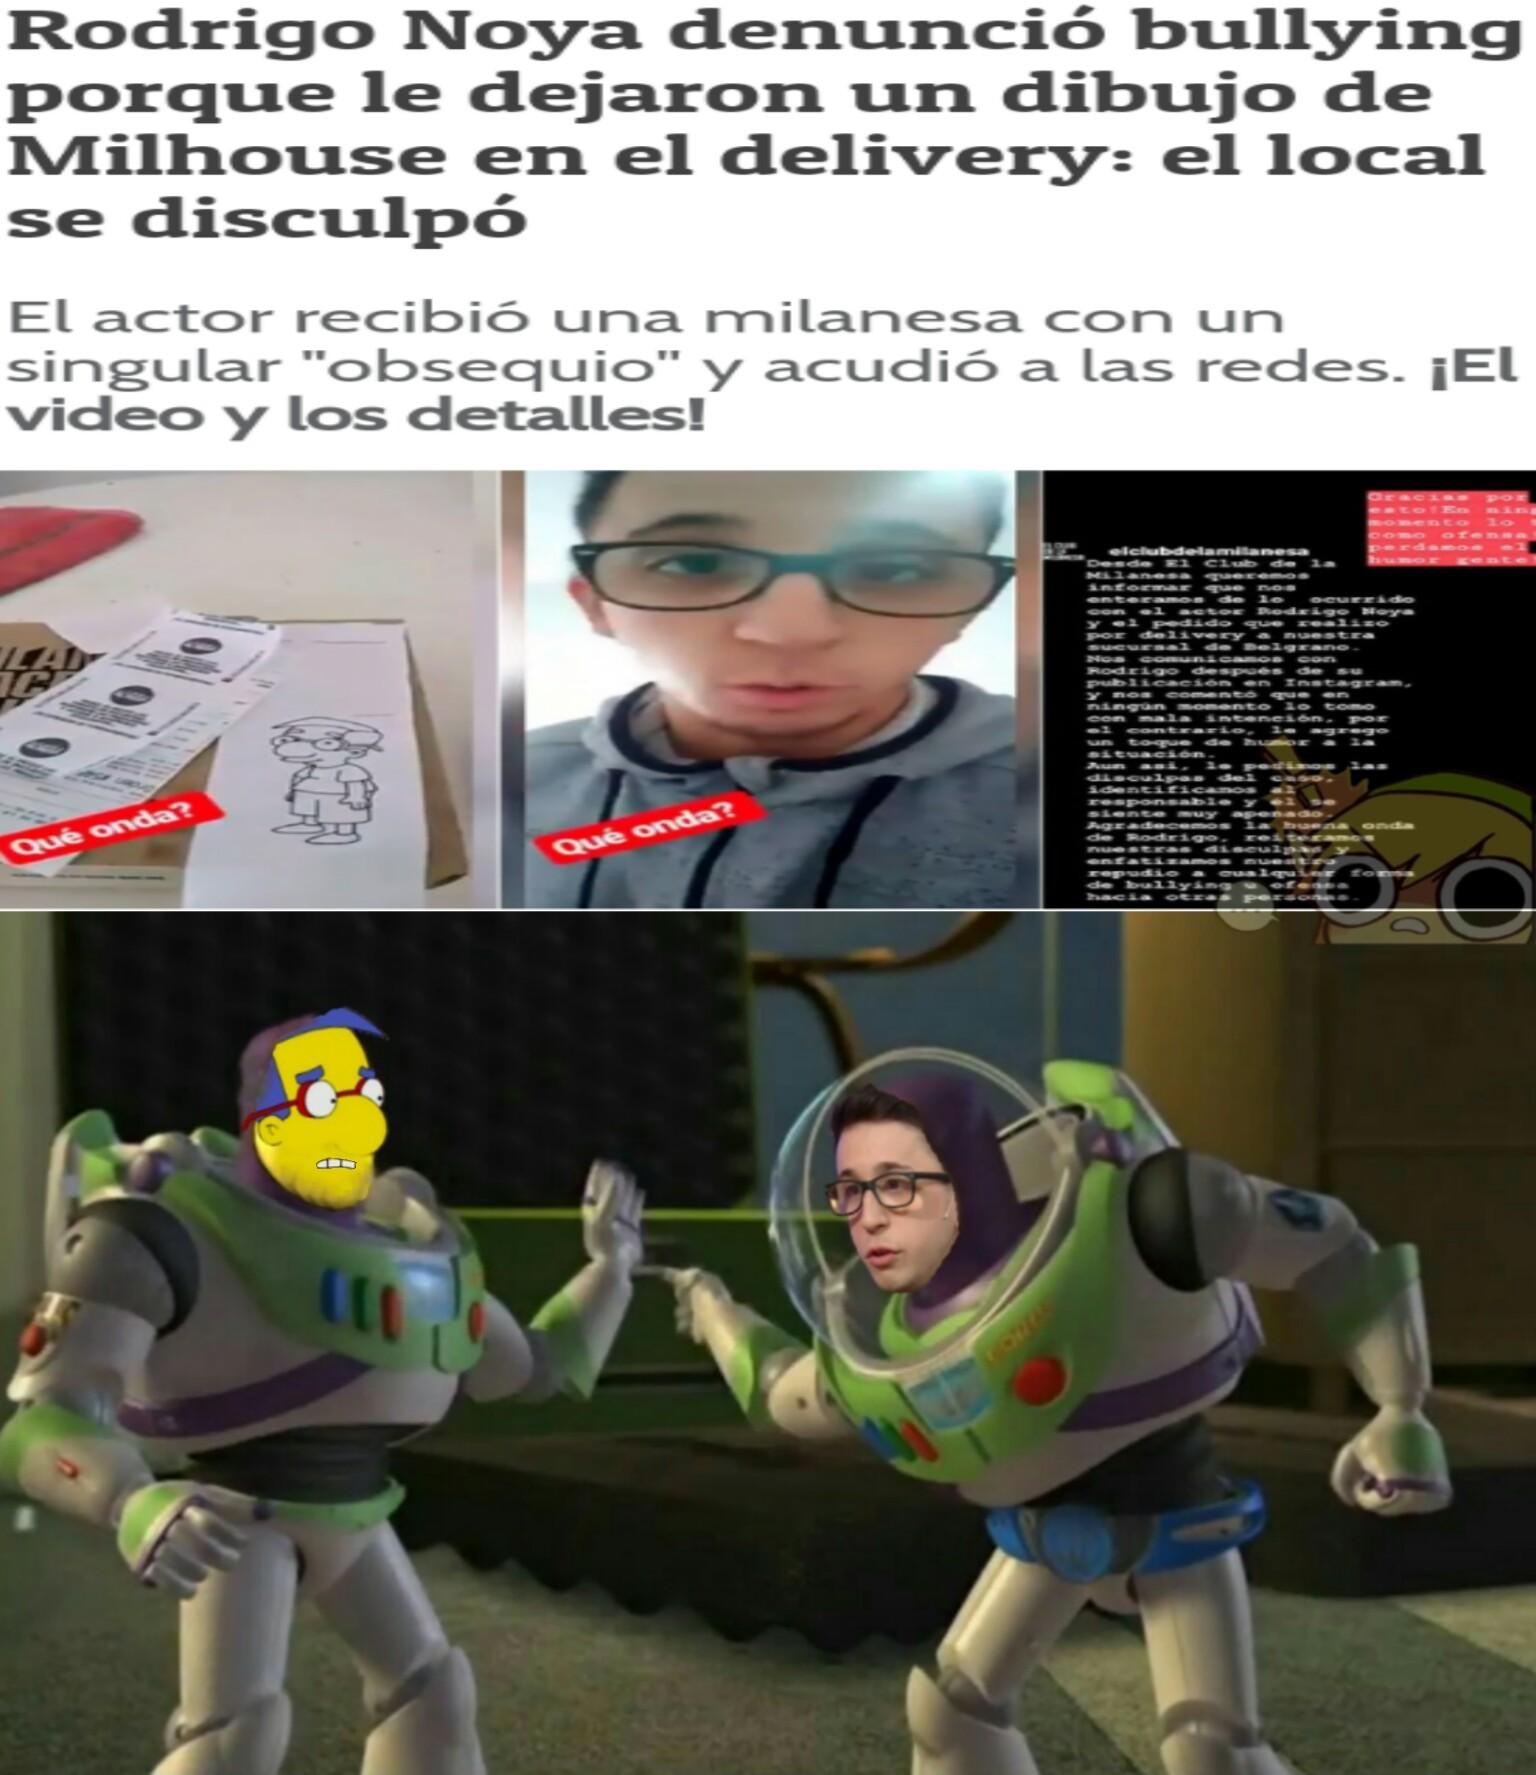 Yo soy Buzz Lightyear! No, yo soy Buzz Lightyear! - meme